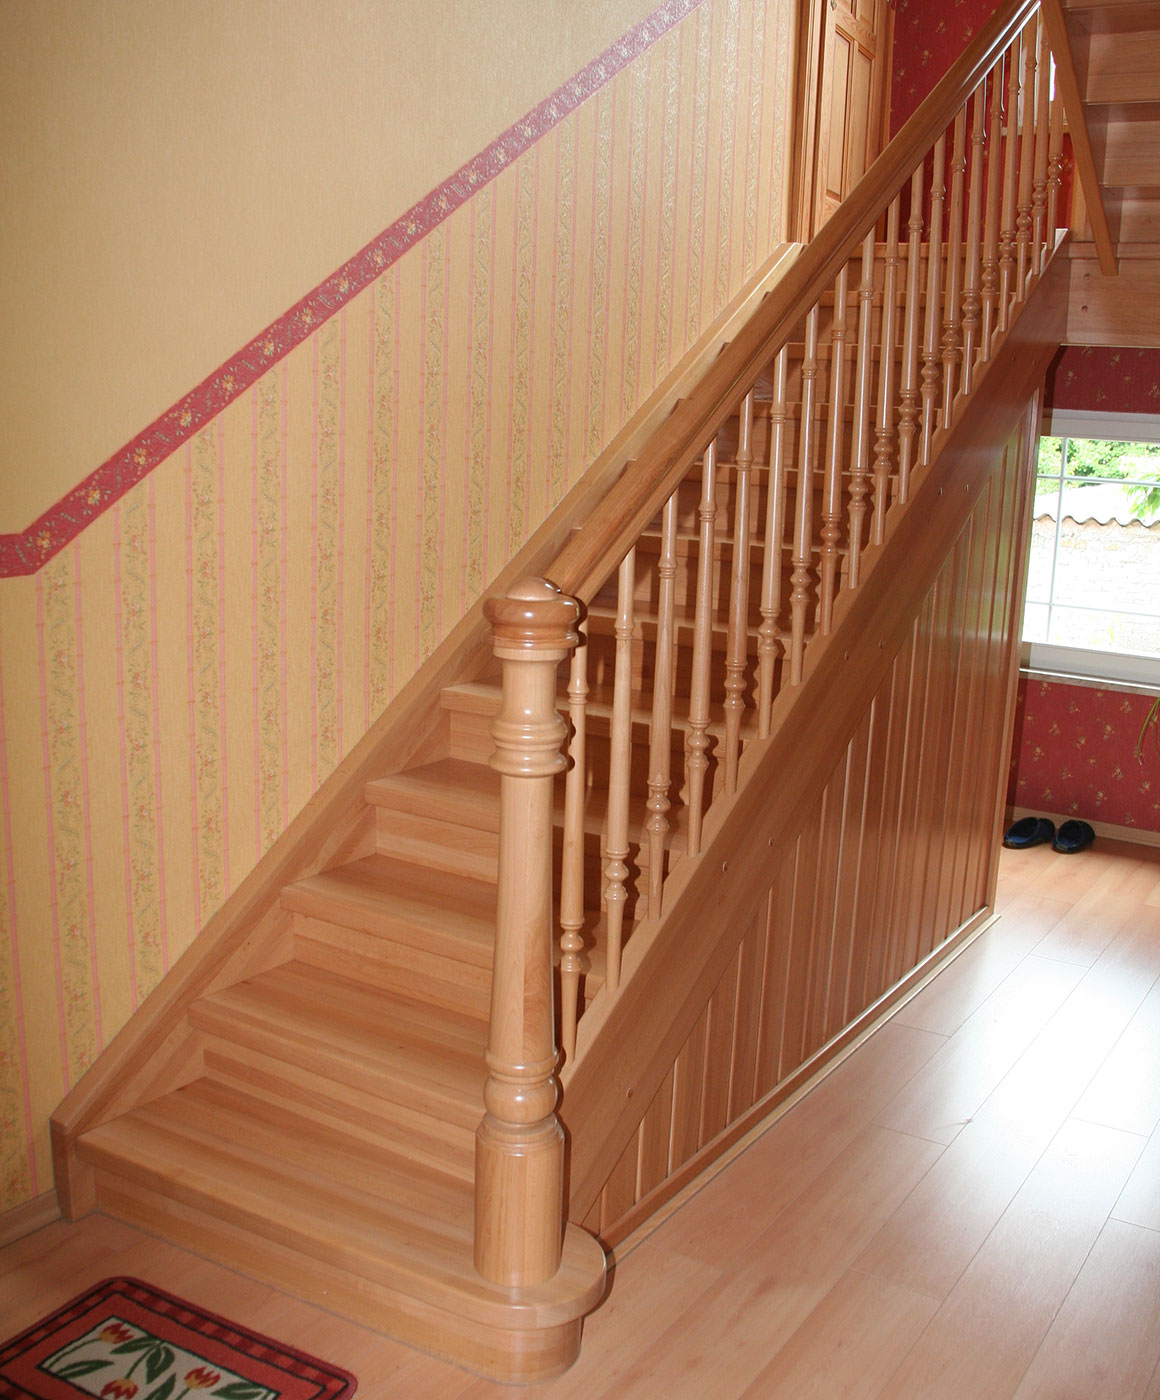 treppen roland plz 15306 vierlinden geschlossene. Black Bedroom Furniture Sets. Home Design Ideas